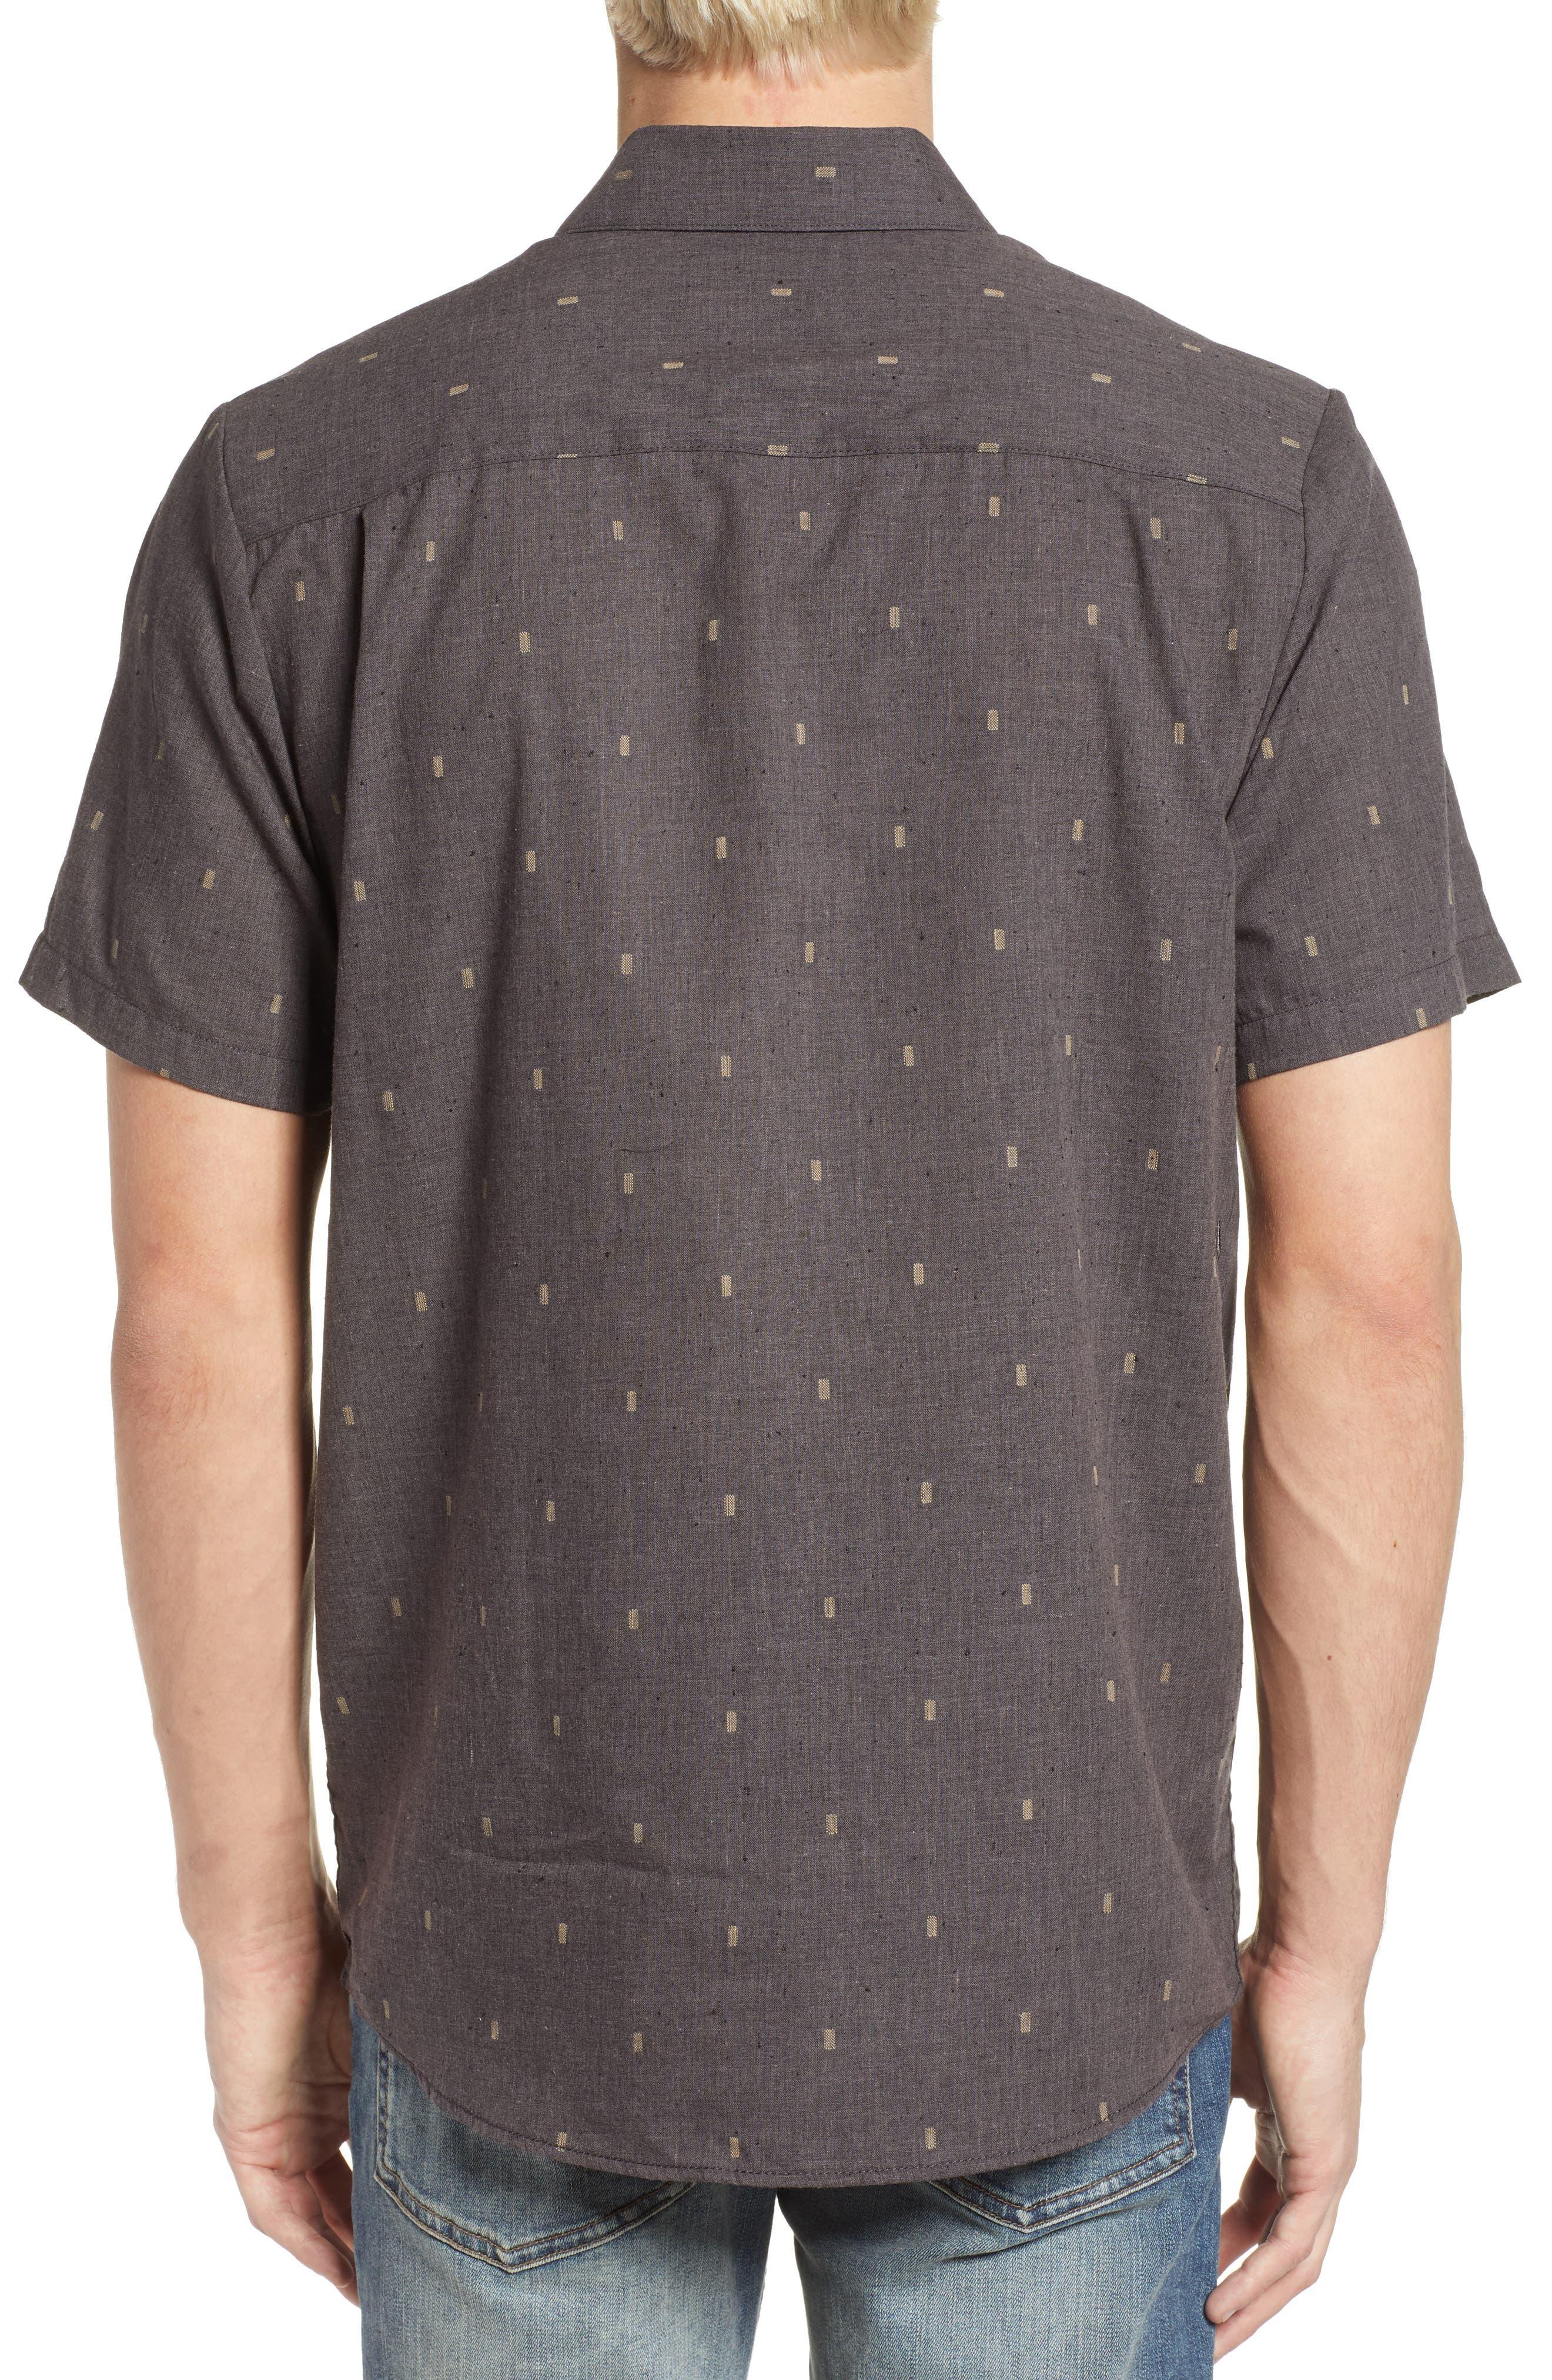 Gladstone Short Sleeve Shirt,                             Alternate thumbnail 2, color,                             001